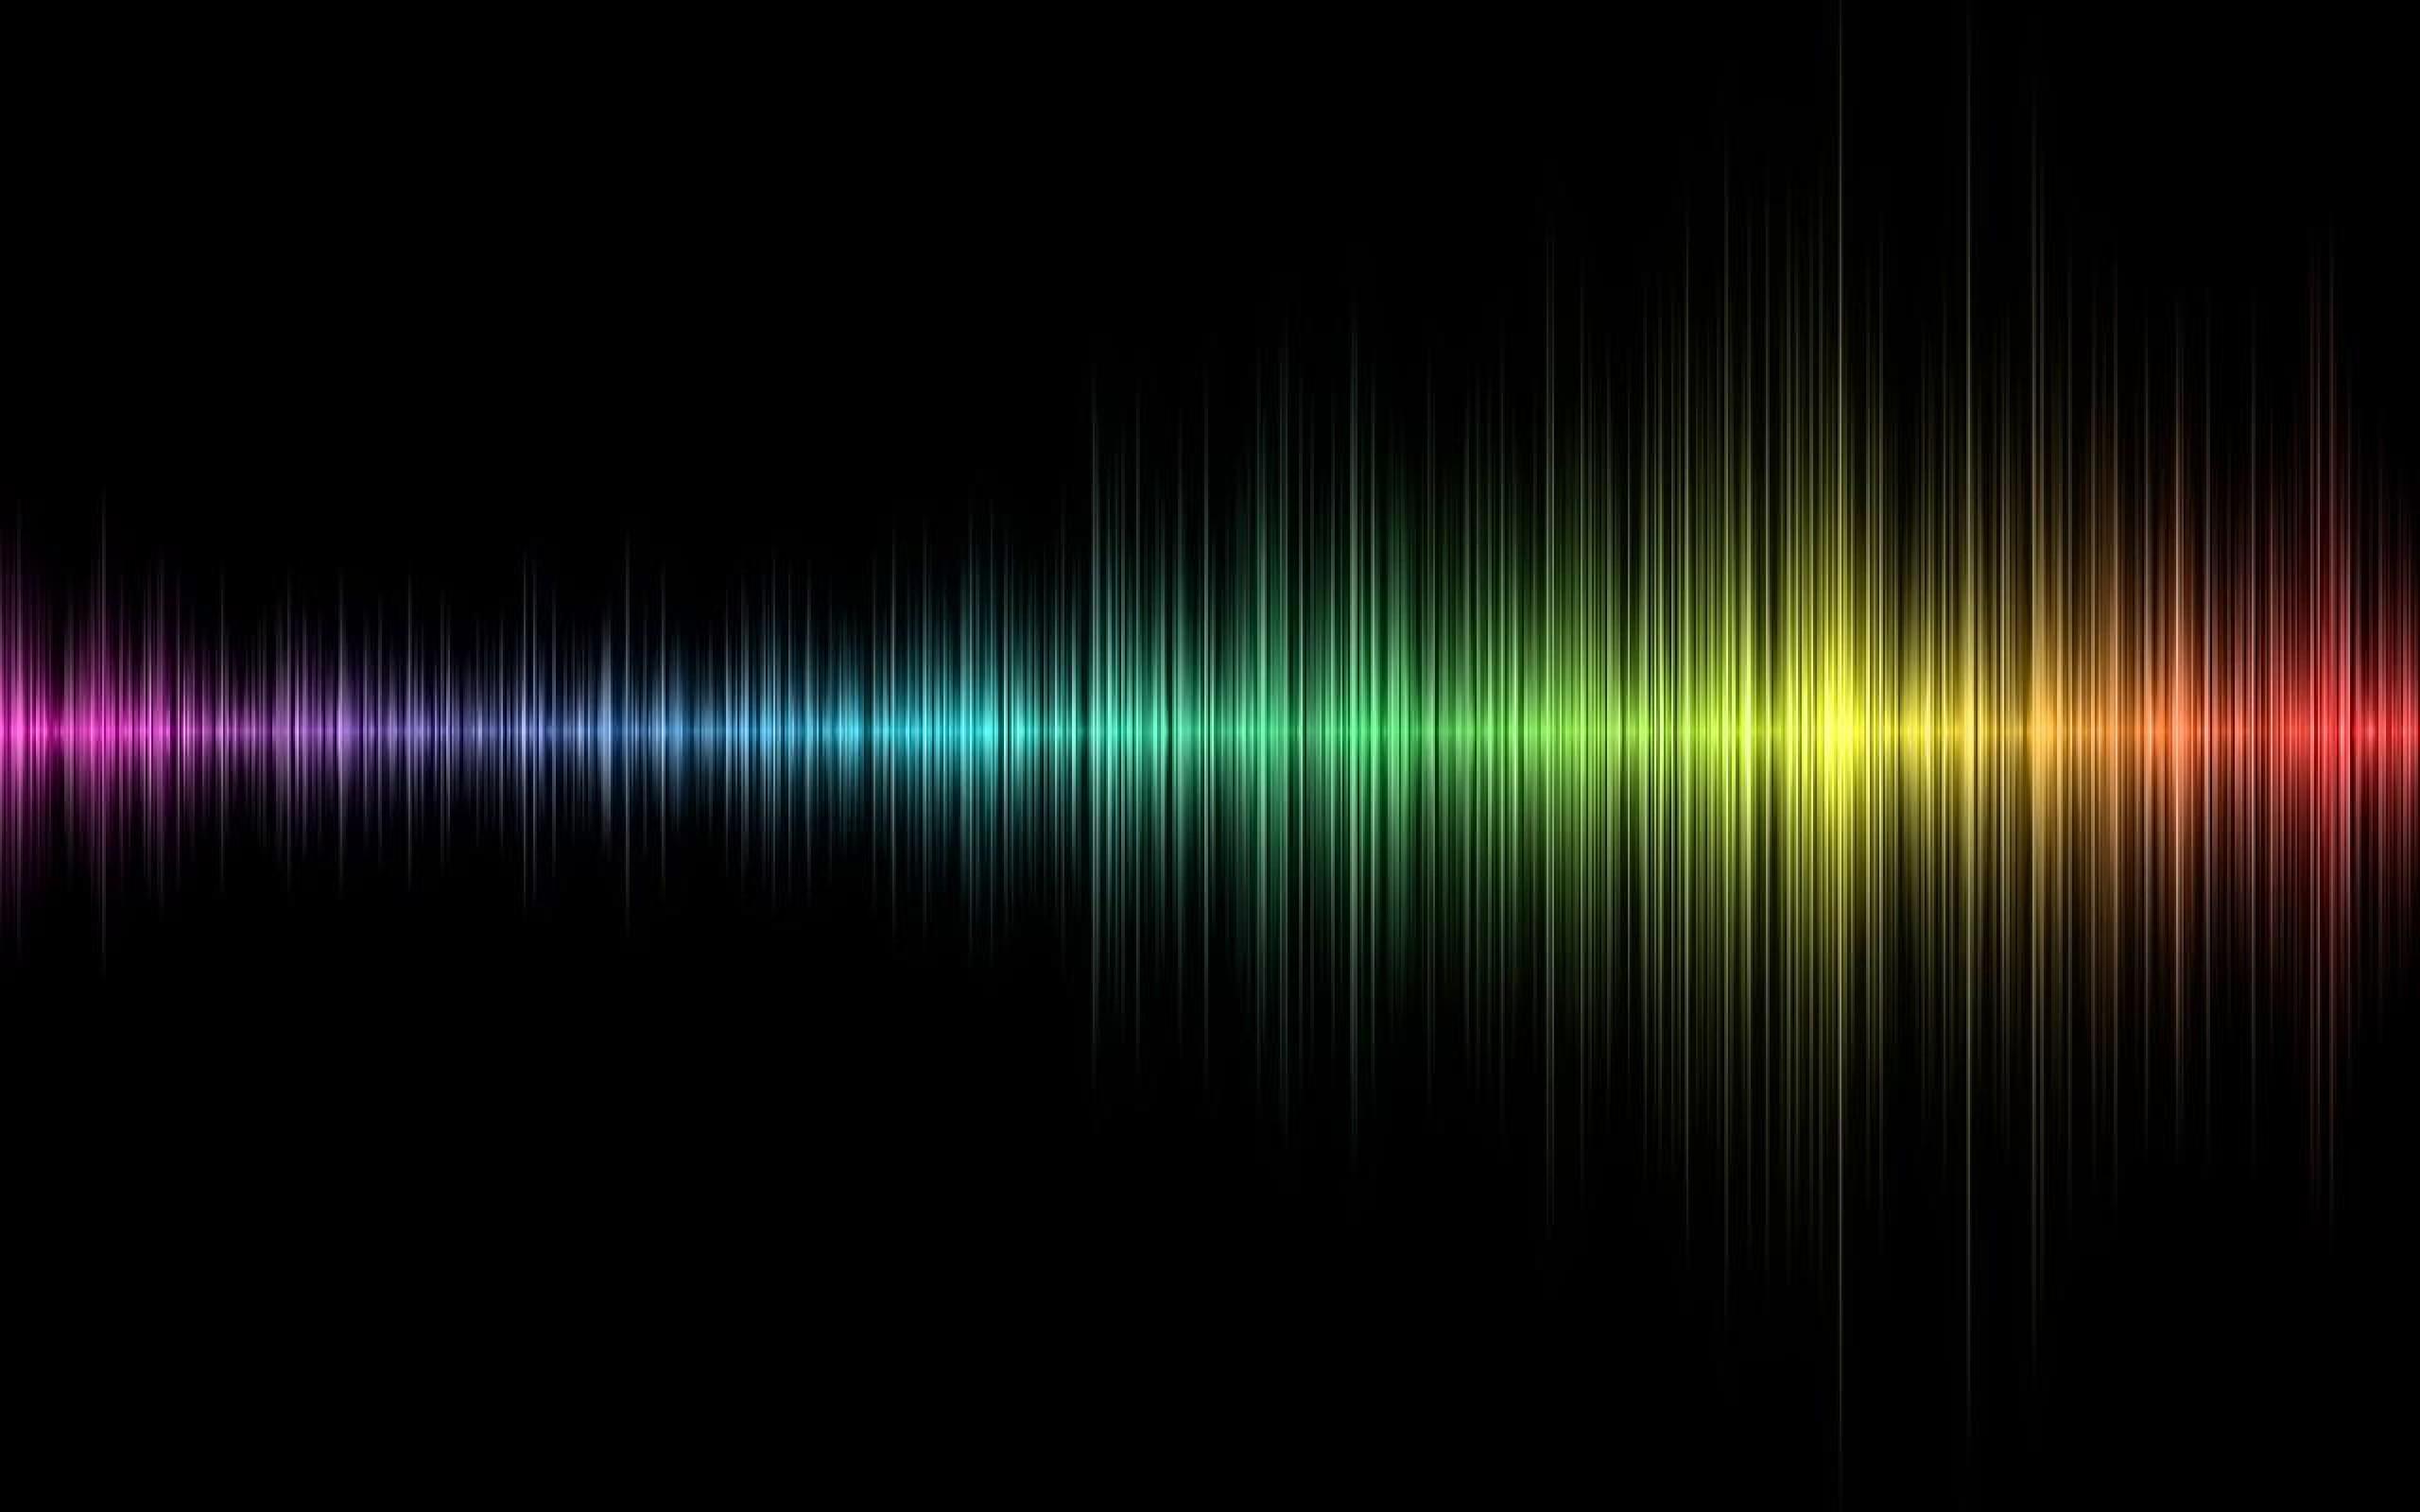 Music Wave Wallpaper